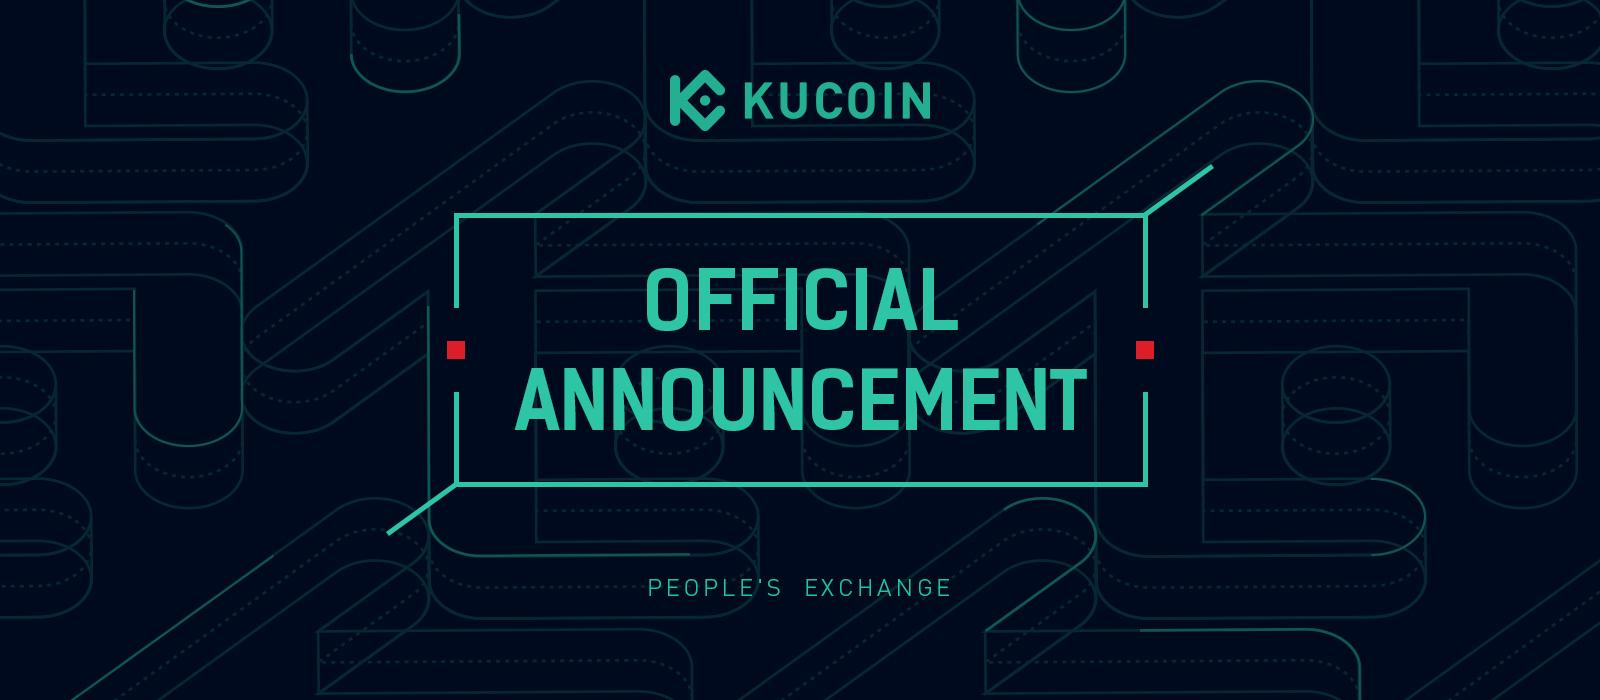 Bitcoin Exchange Cryptocurrency Exchange Bitcoin Trading Kucoin